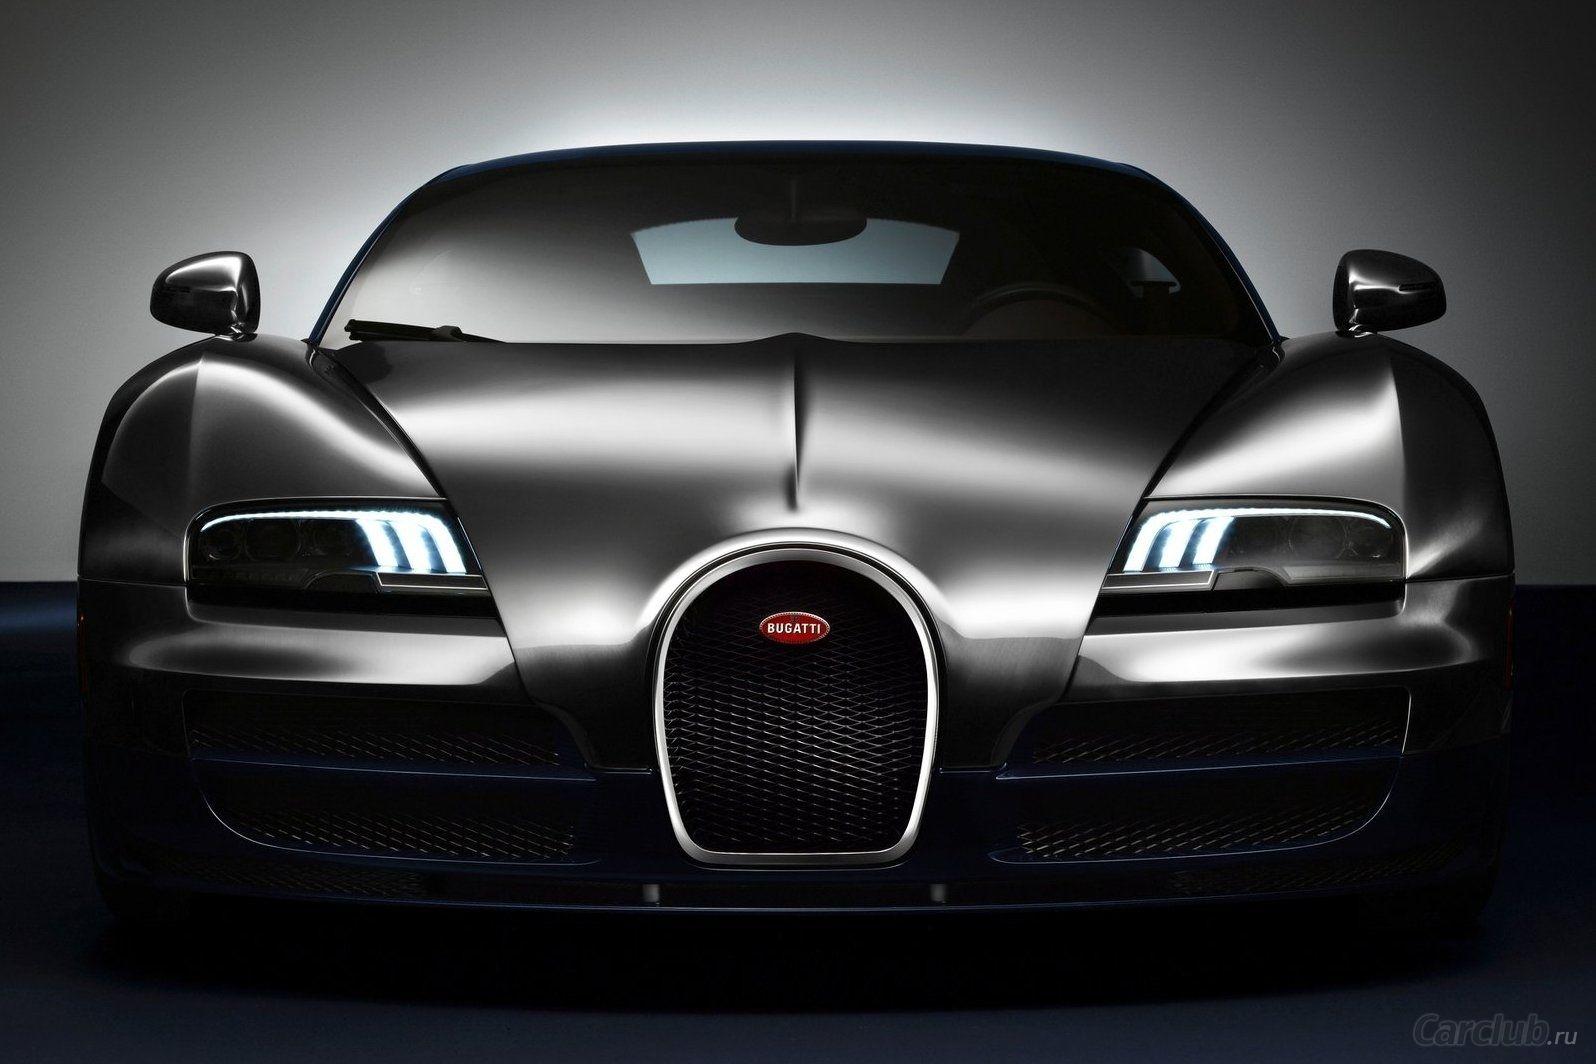 2014 bugatti veyron ettore bugatti bugatti veyron top speed bugatti